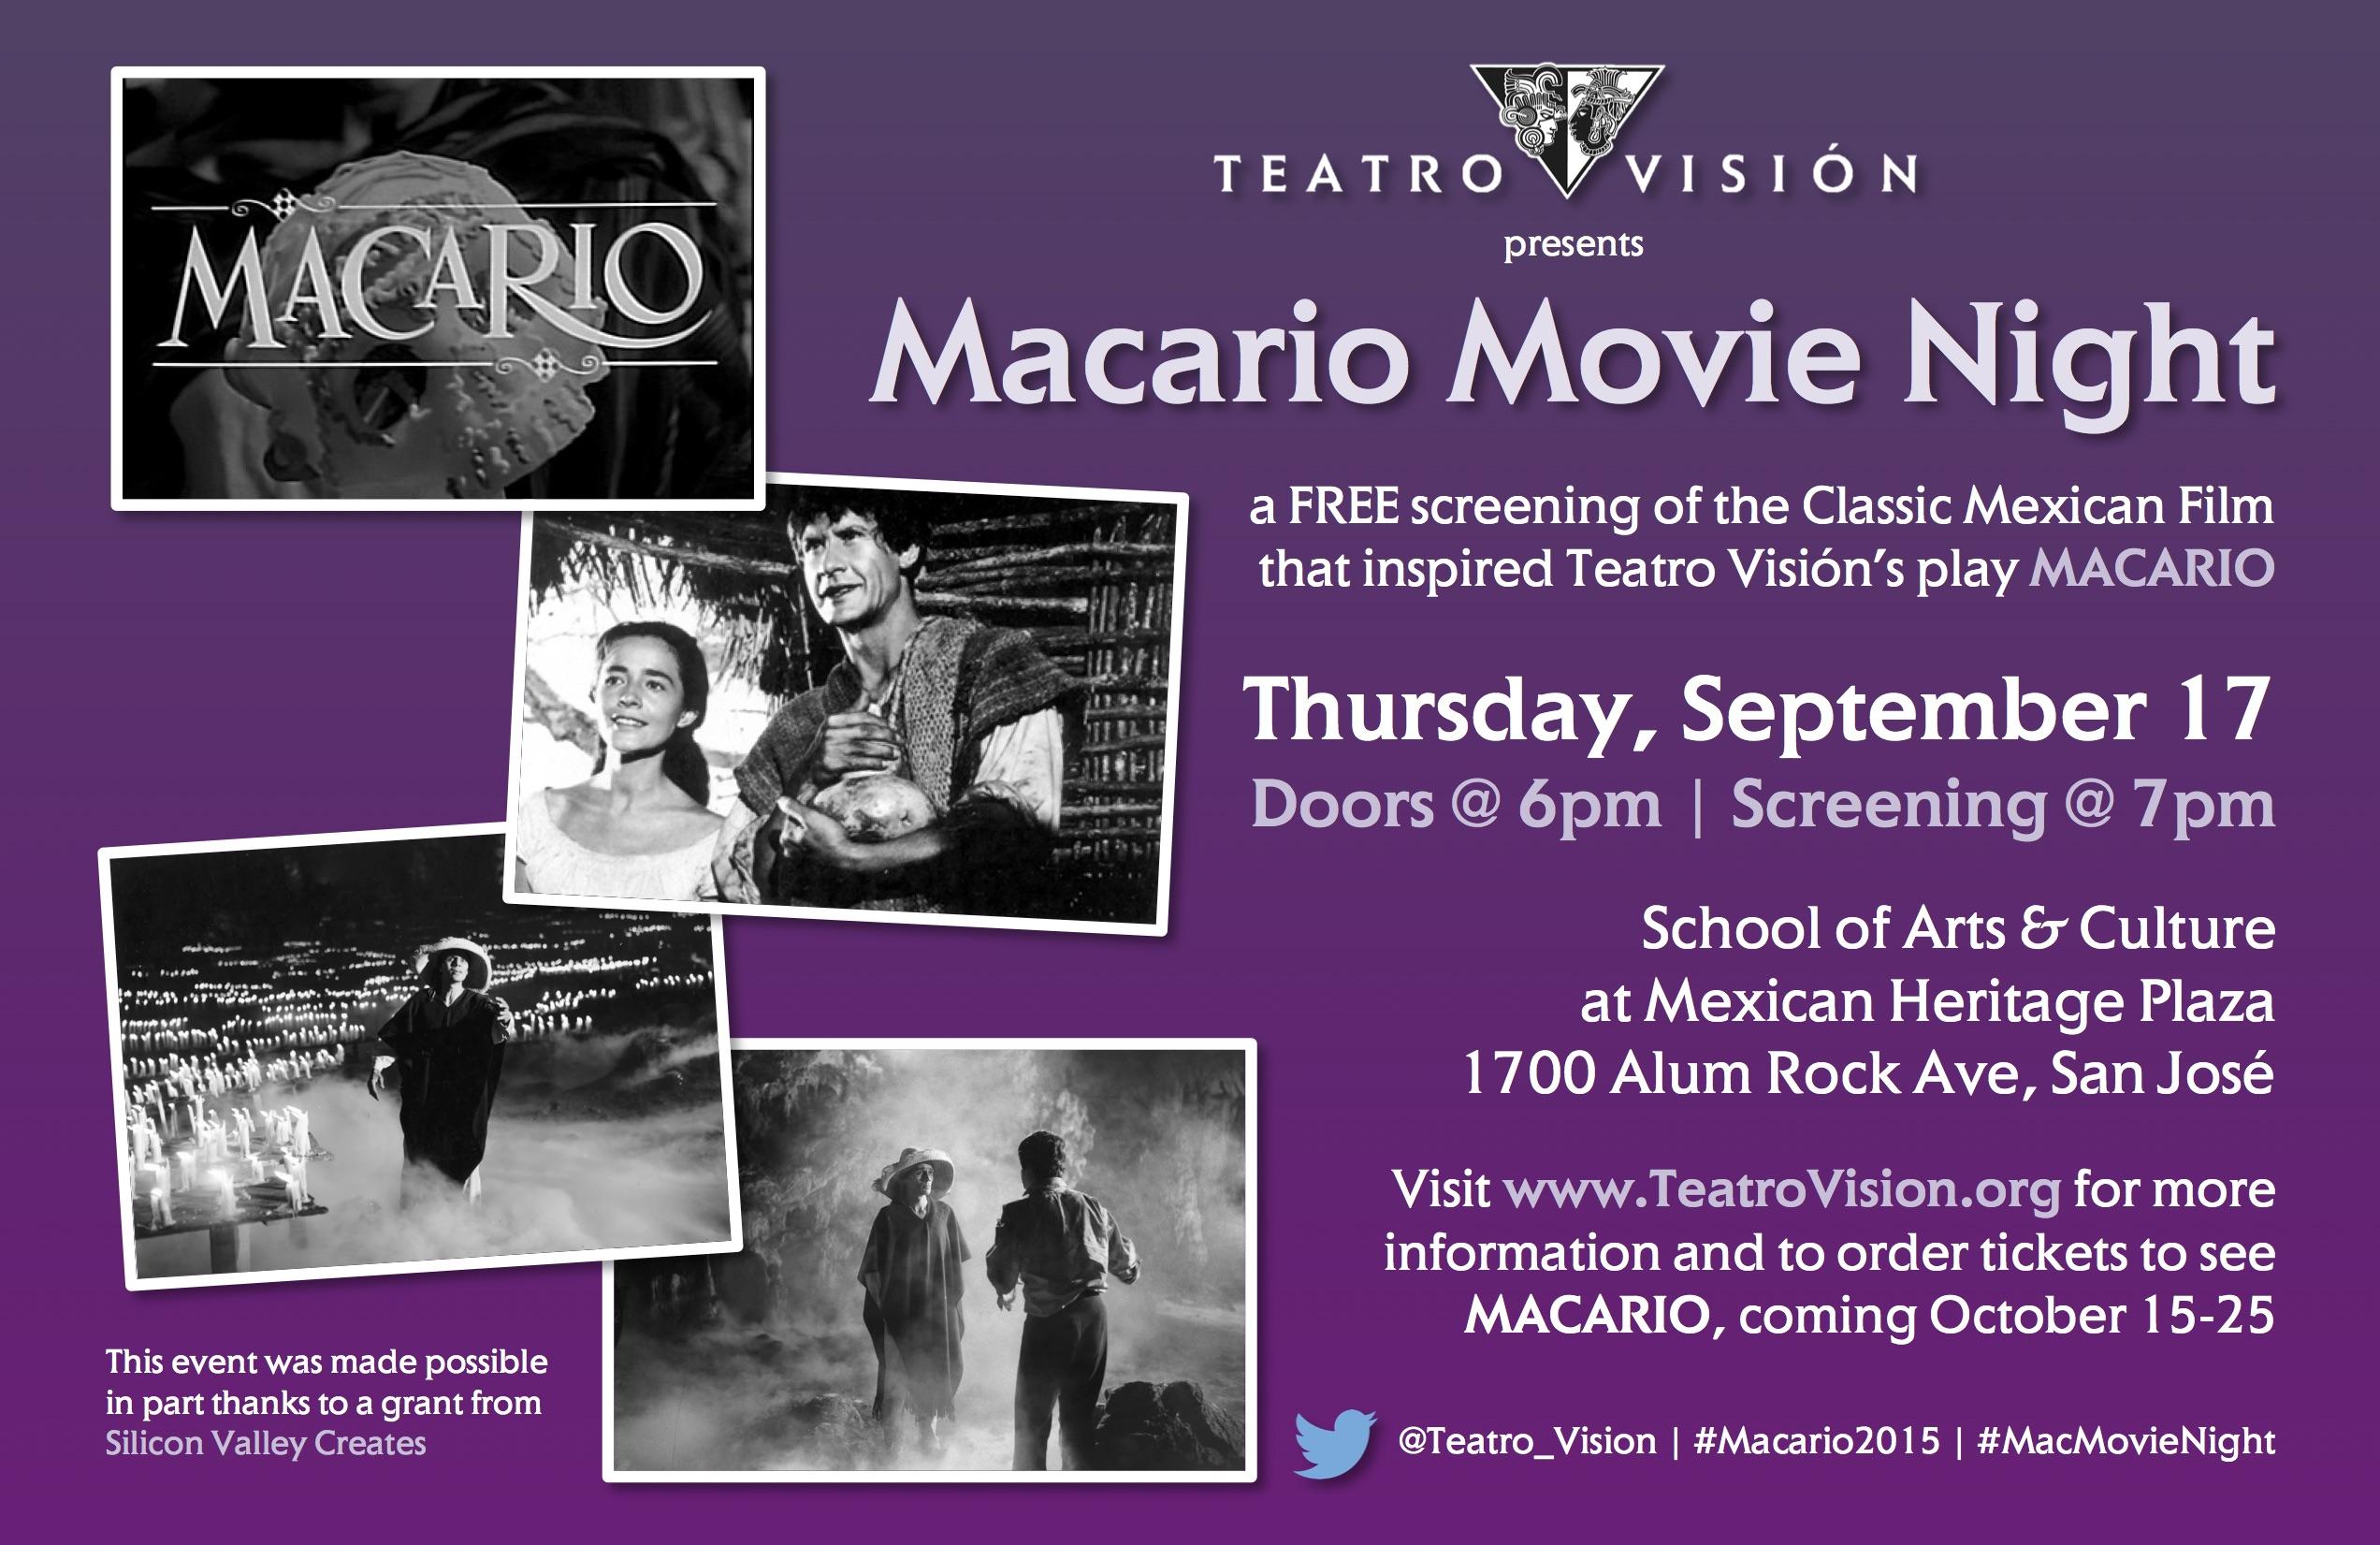 MACARIO 2015 Movie Night flyer